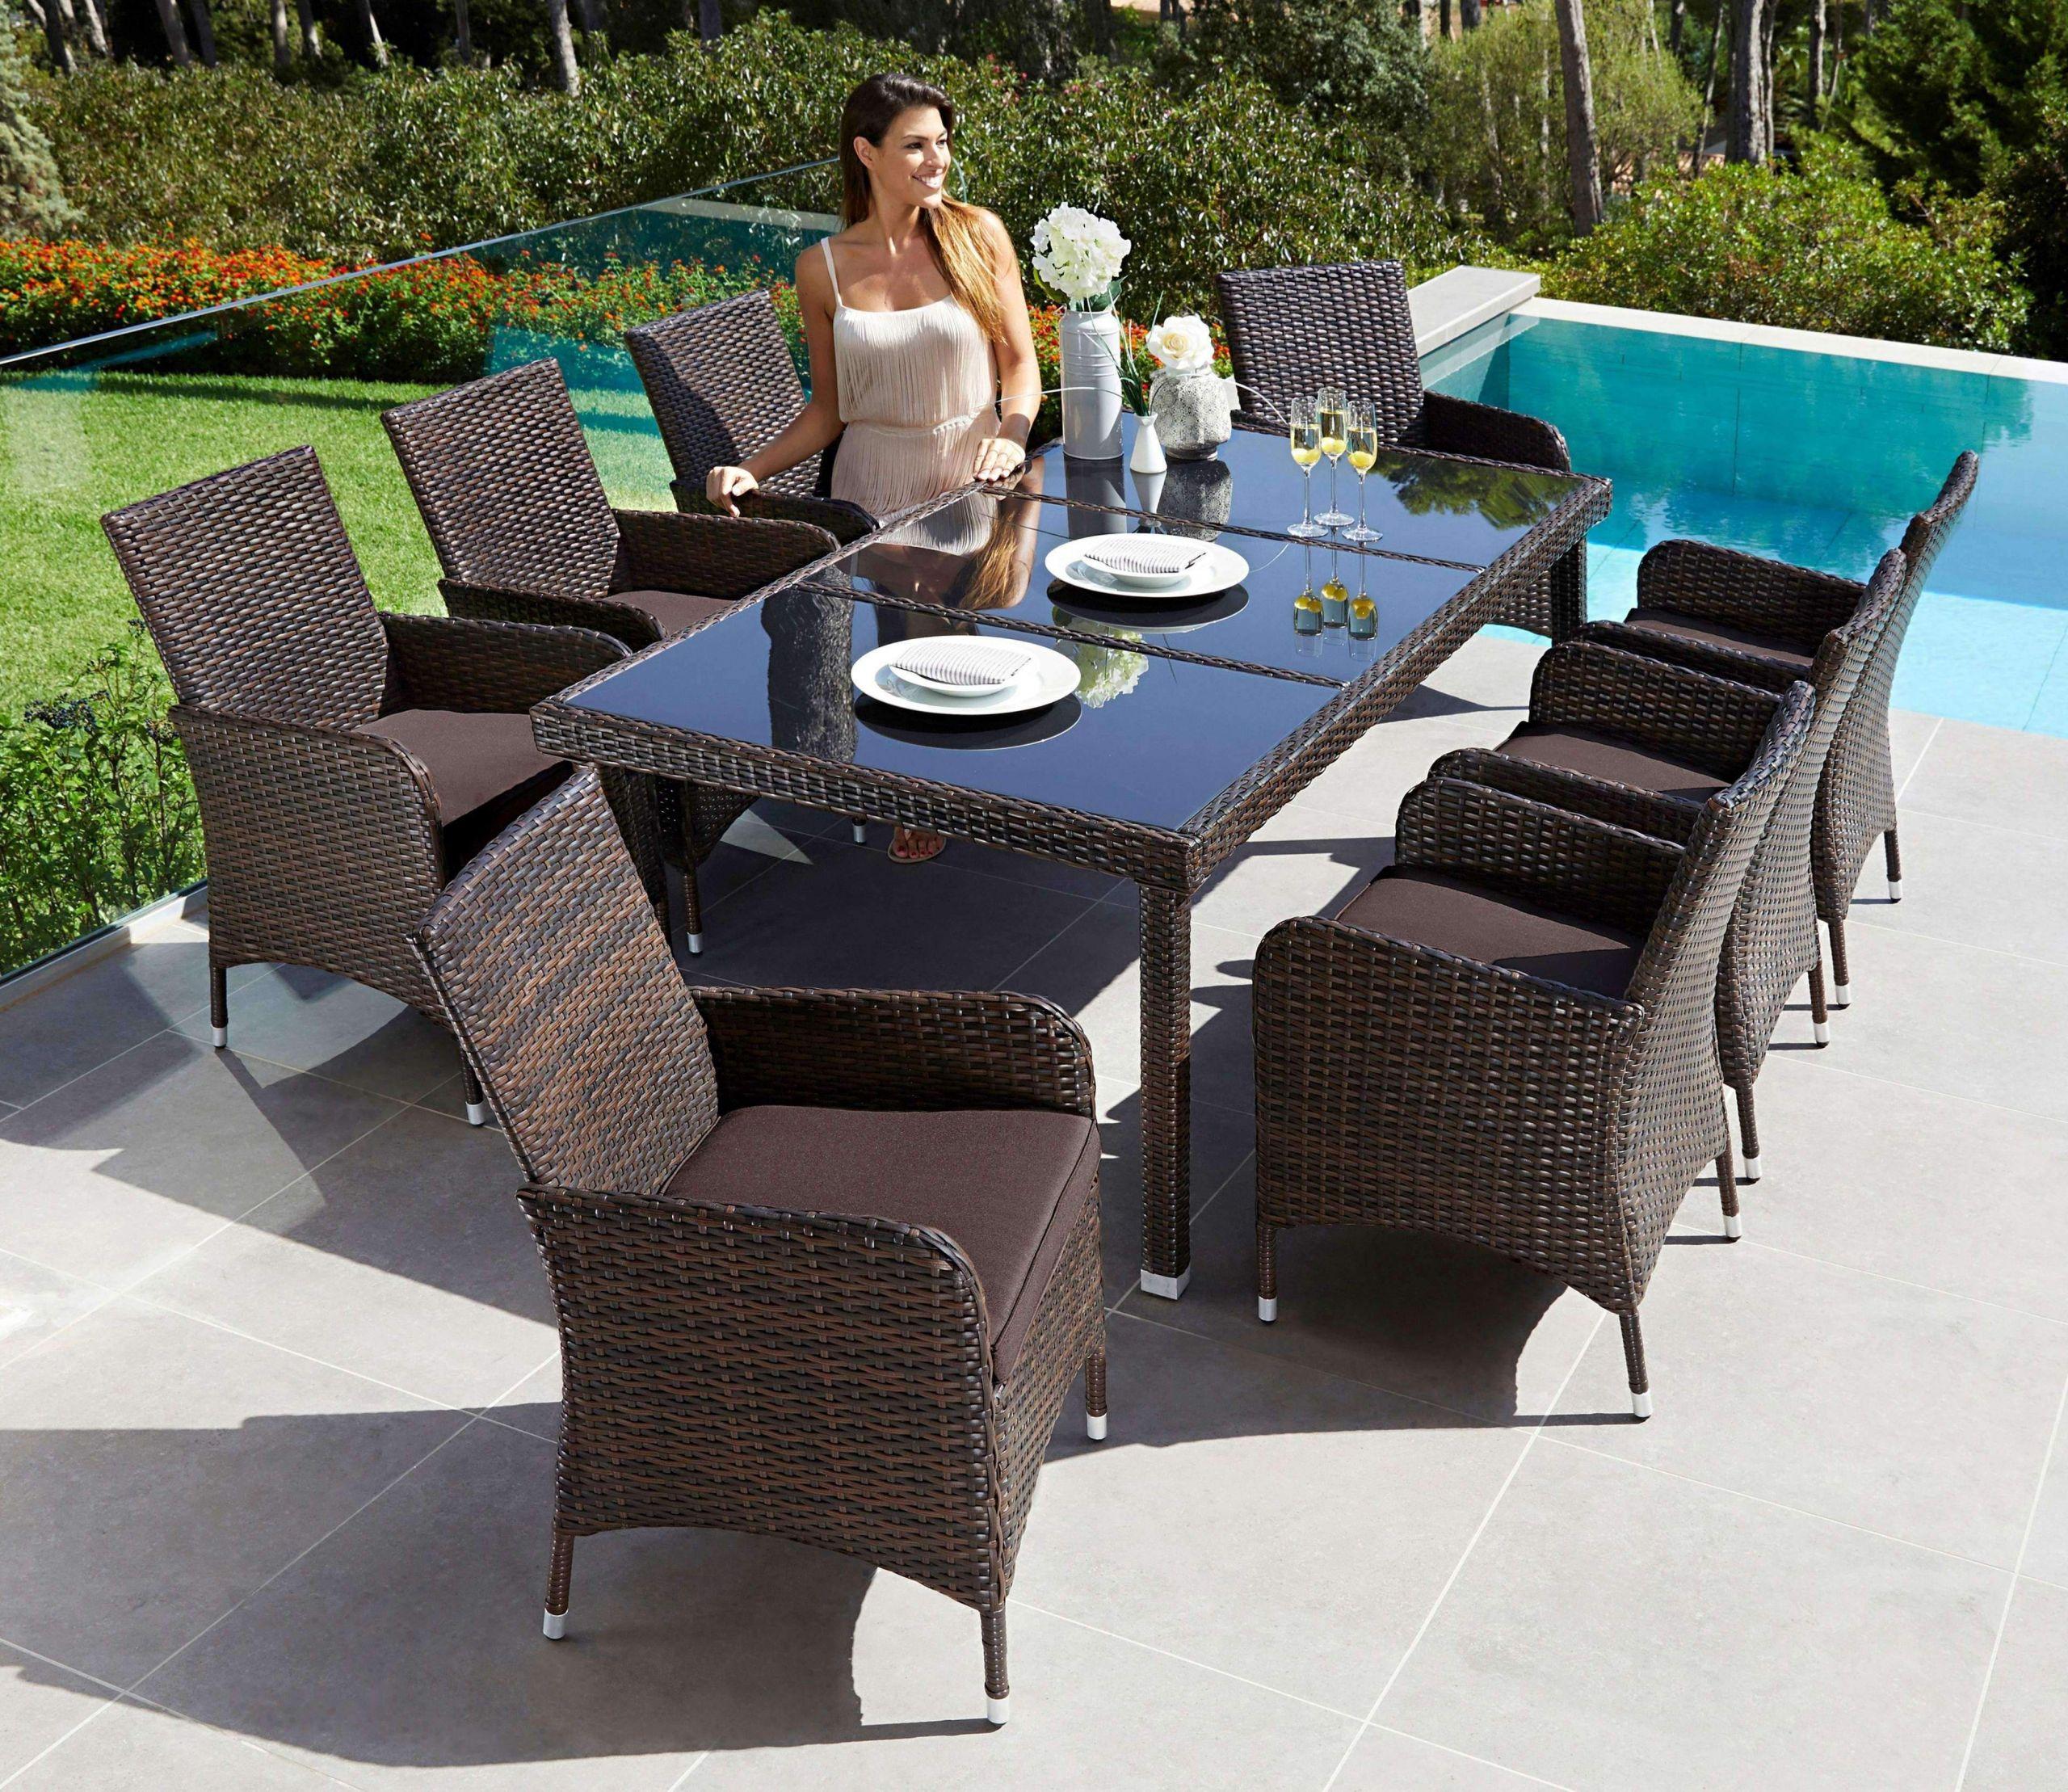 outdoor sitzsack ikea ikea sessel garten design von outdoor ekk2rfgk of xxl sessel ikea